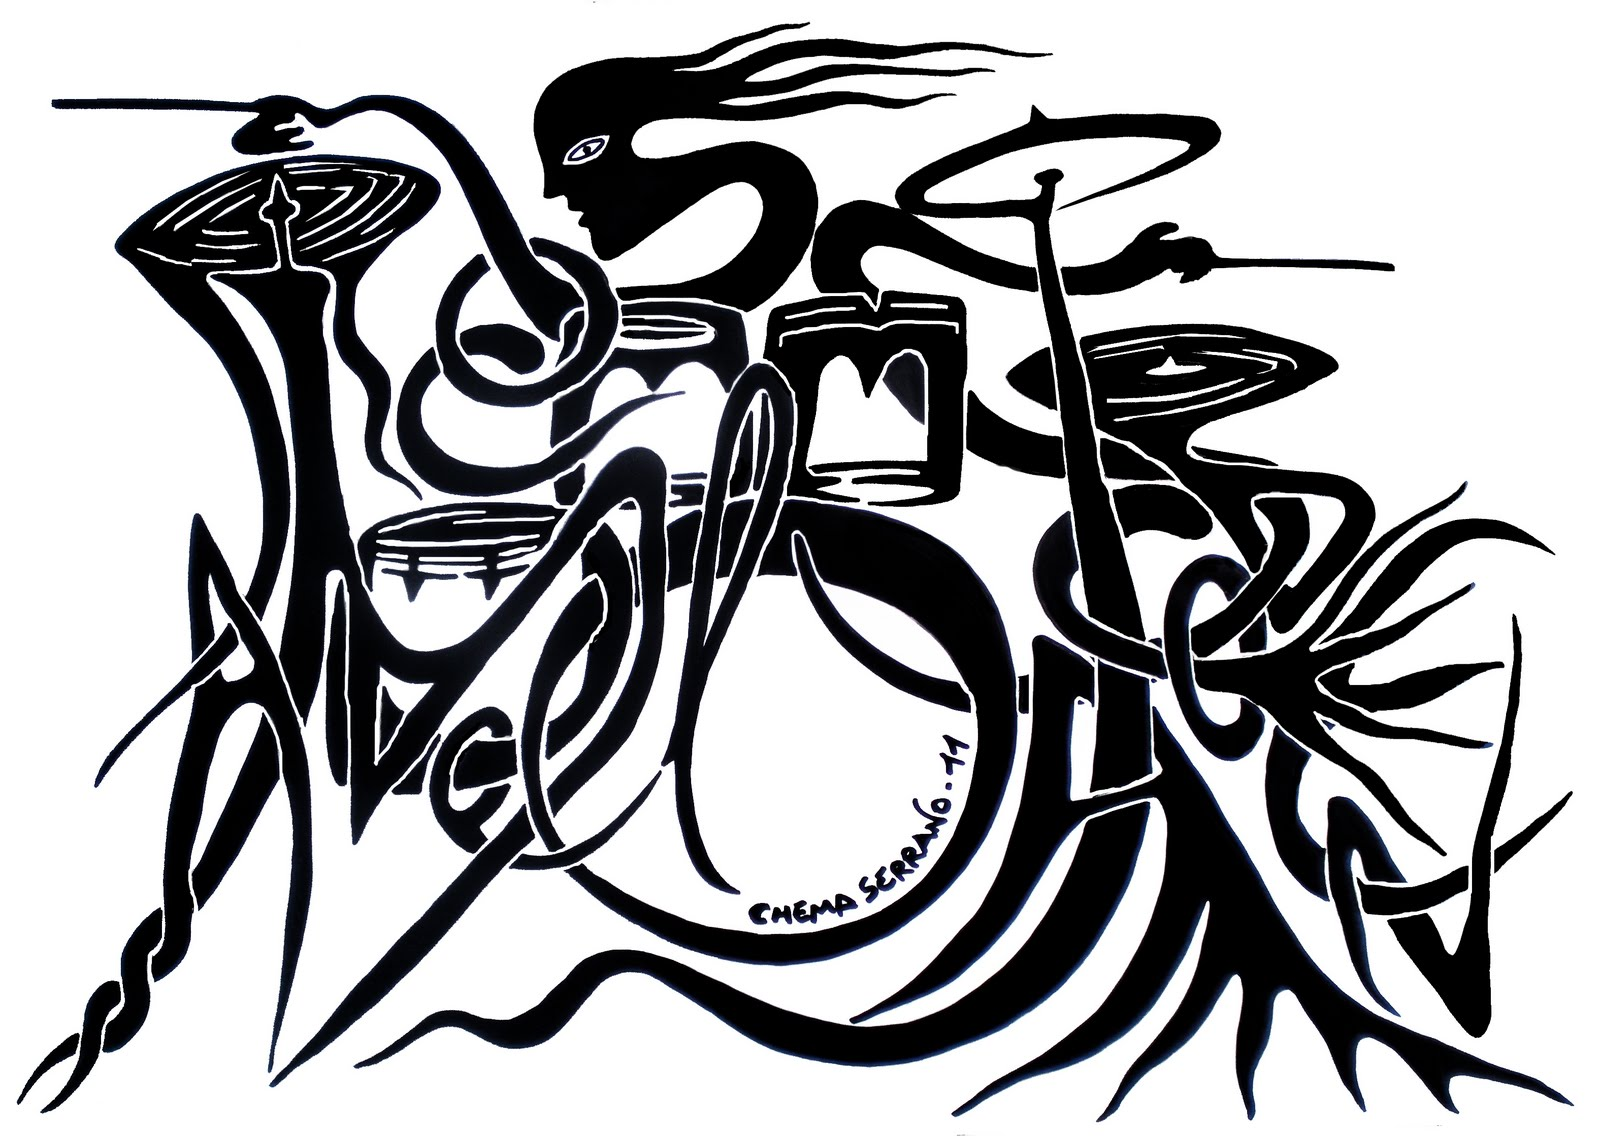 ARTE EN EL ALMA: Dibujo Nombre: MARCOS DEL AMO JACOBSEN